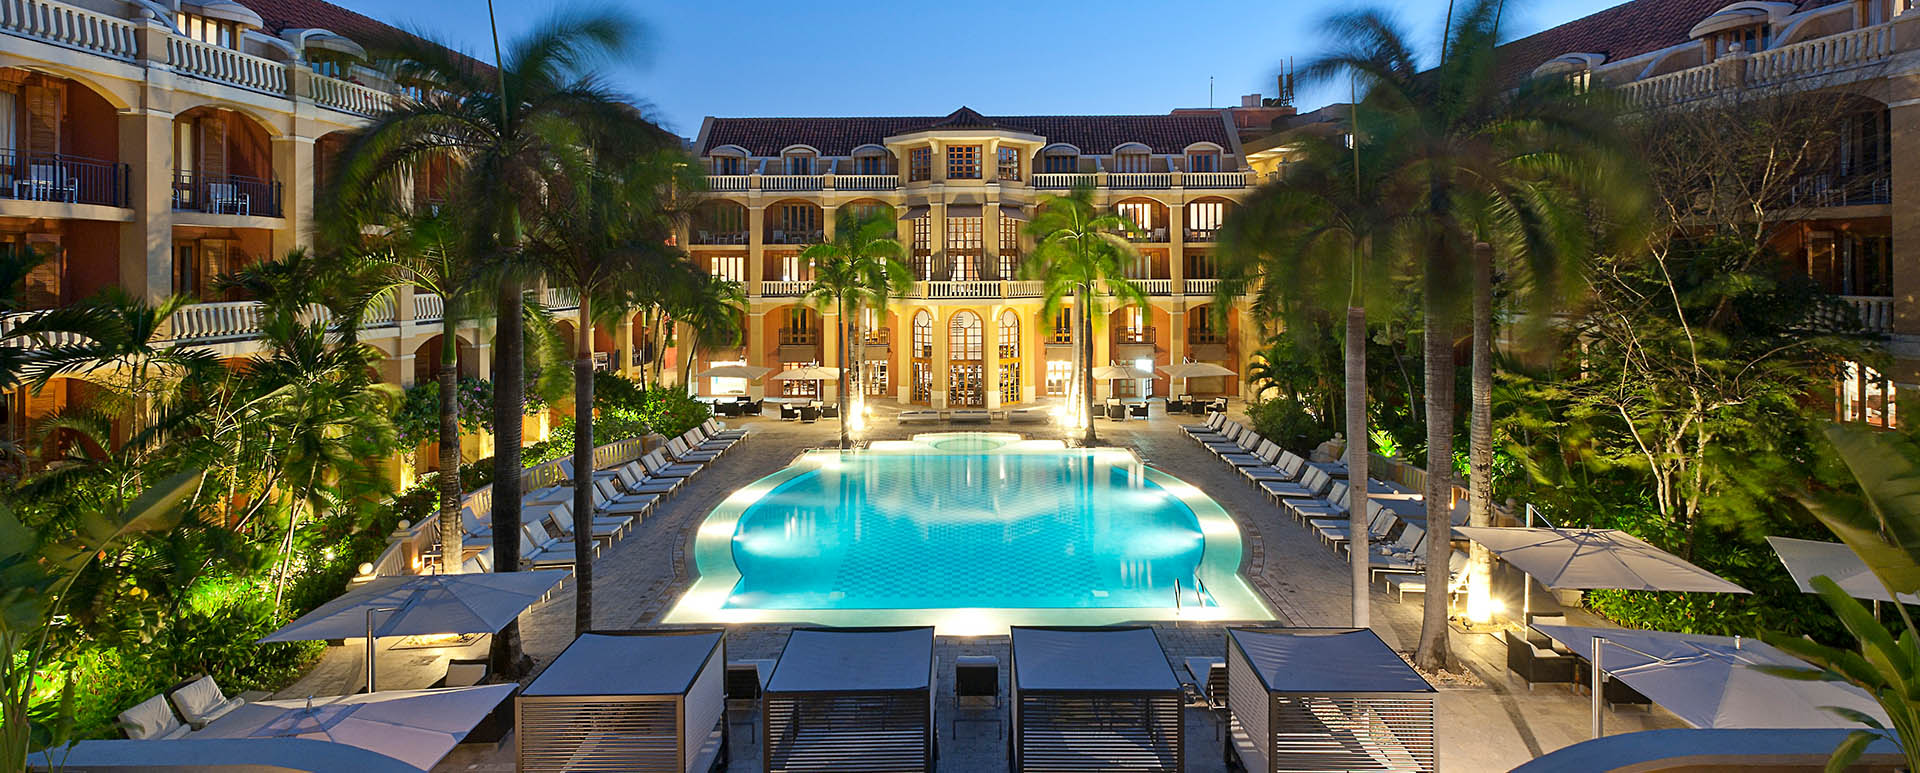 Santa Clara Hotel pool